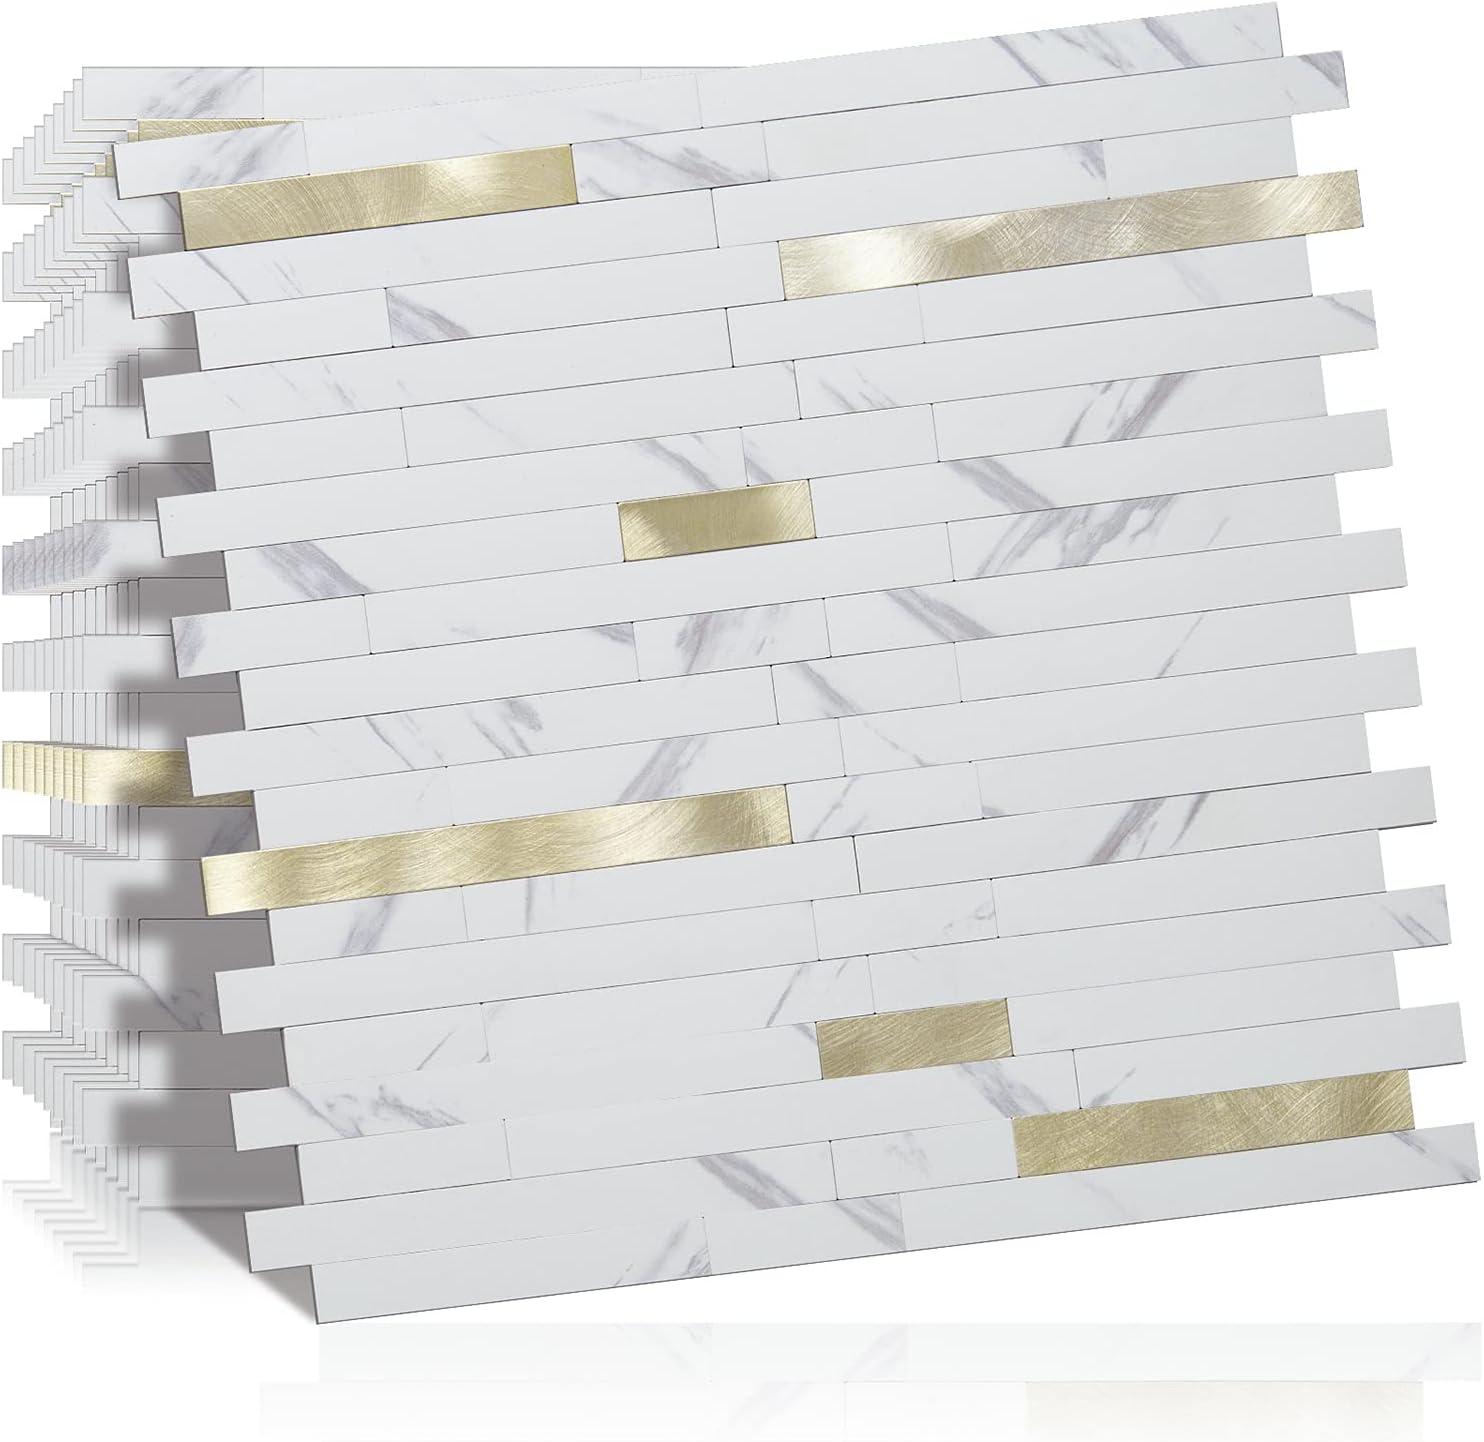 DICOFUN 2021 model 10-Sheet Peel and Stick Kitche Wall Quantity limited PVC Backsplash Tile